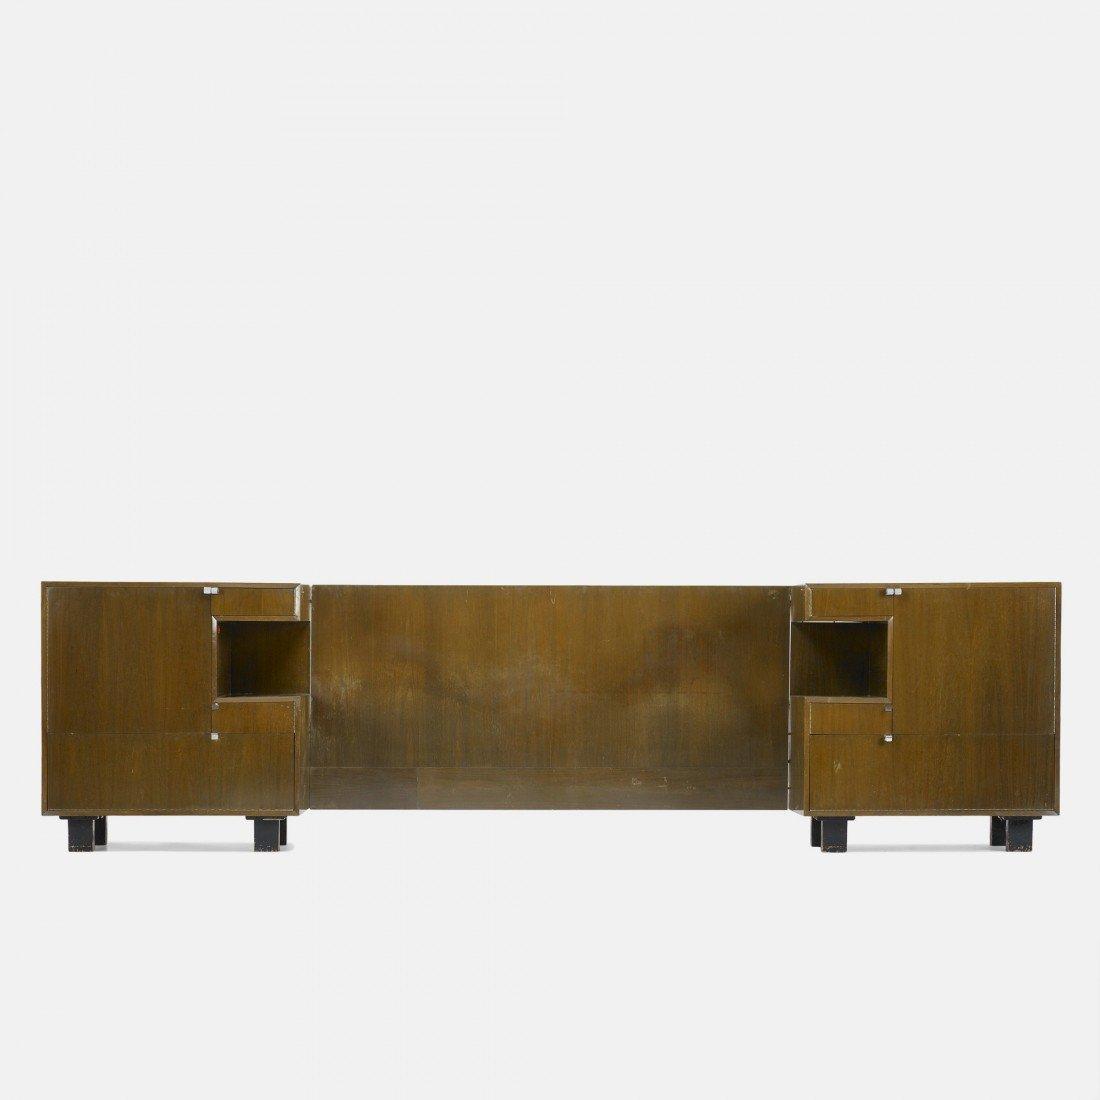 238: Henry Glass custom headboard and nightstands